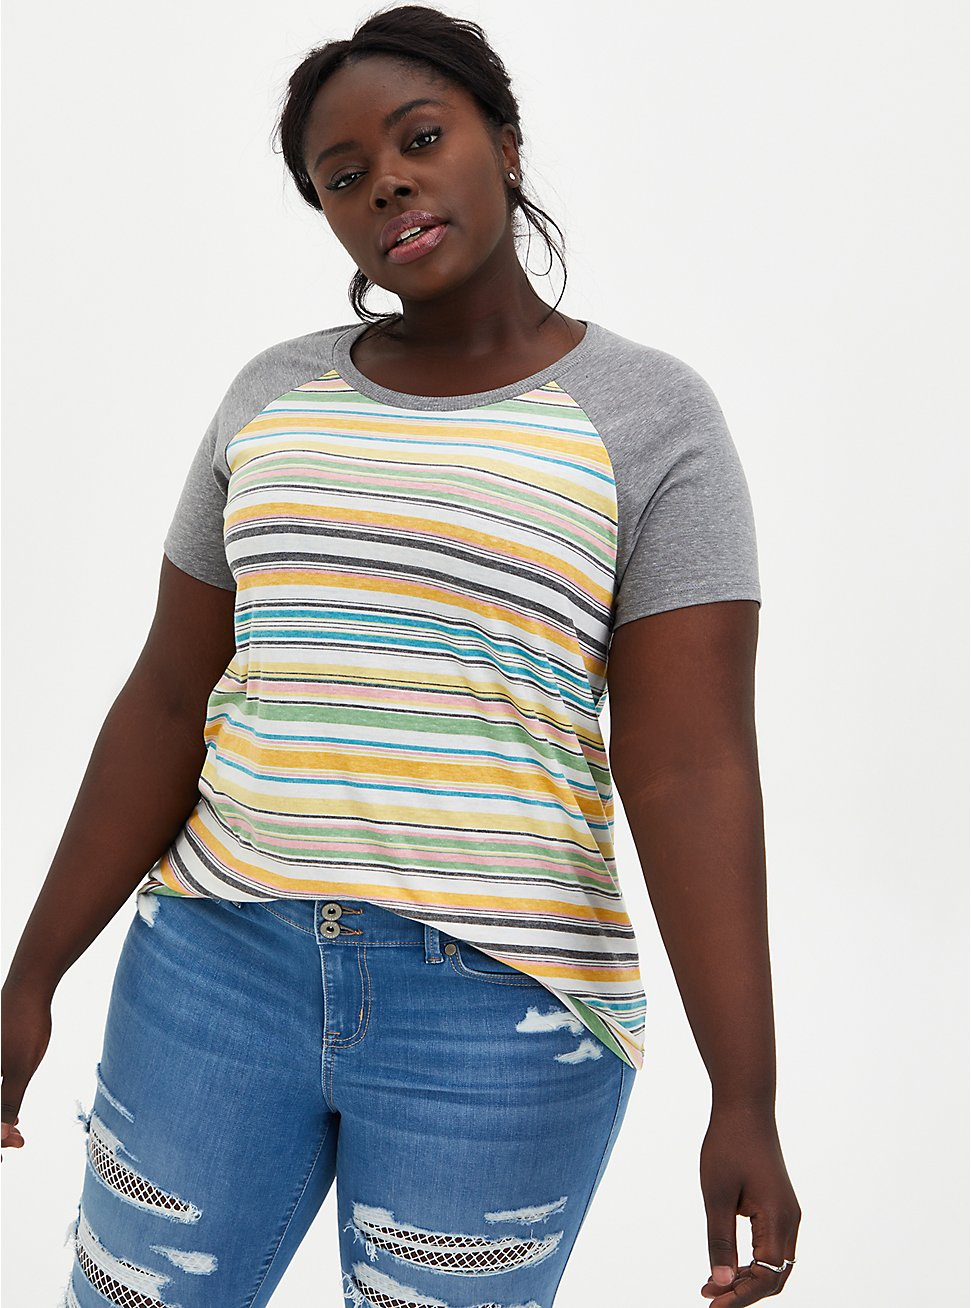 Raglan Tee - Triblend Jersey Multi Stripe, OTHER PRINTS, hi-res